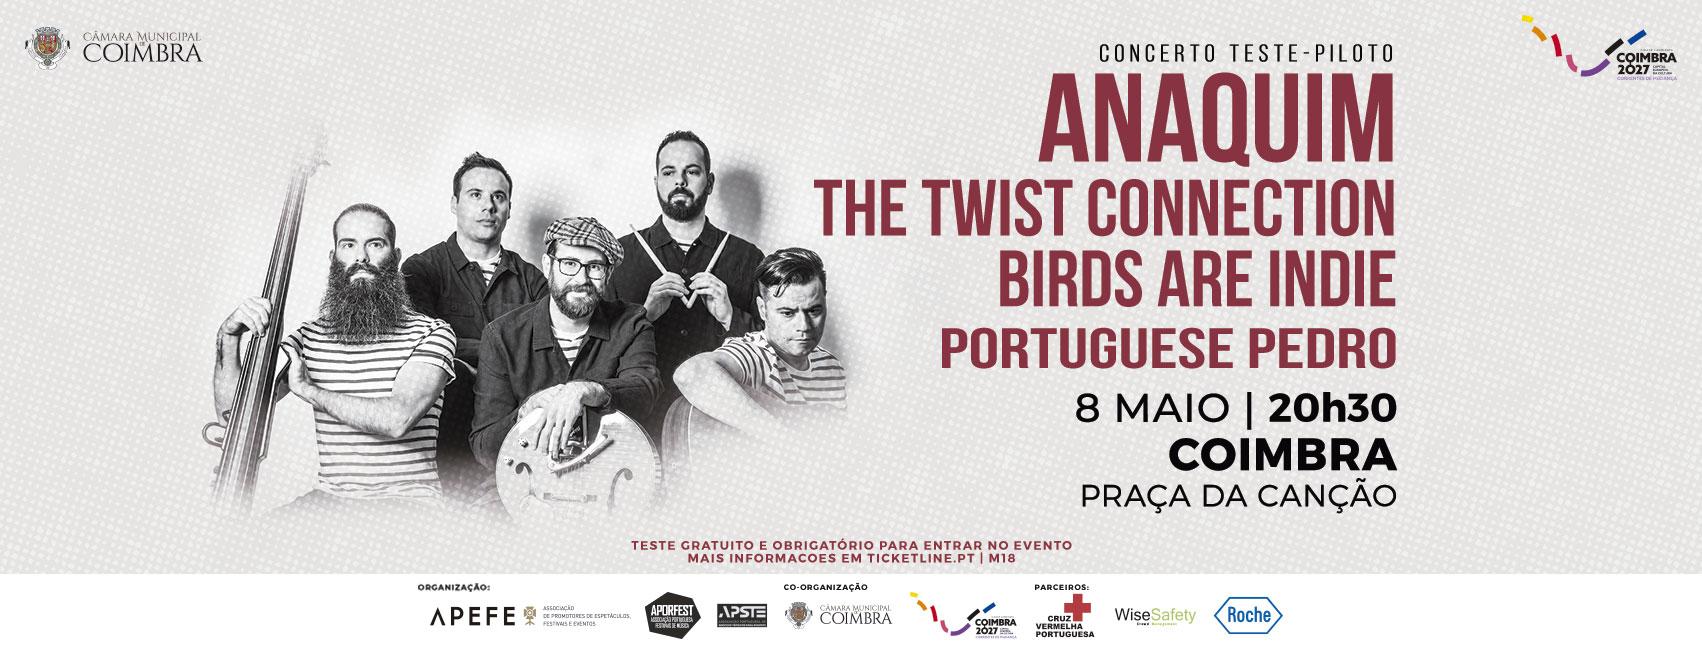 ANAQUIM, THE TWIST CONNECTION, BIRDS ARE INDIE, PORTUGUESE PEDRO - CONCERTO TESTE-PILOTO